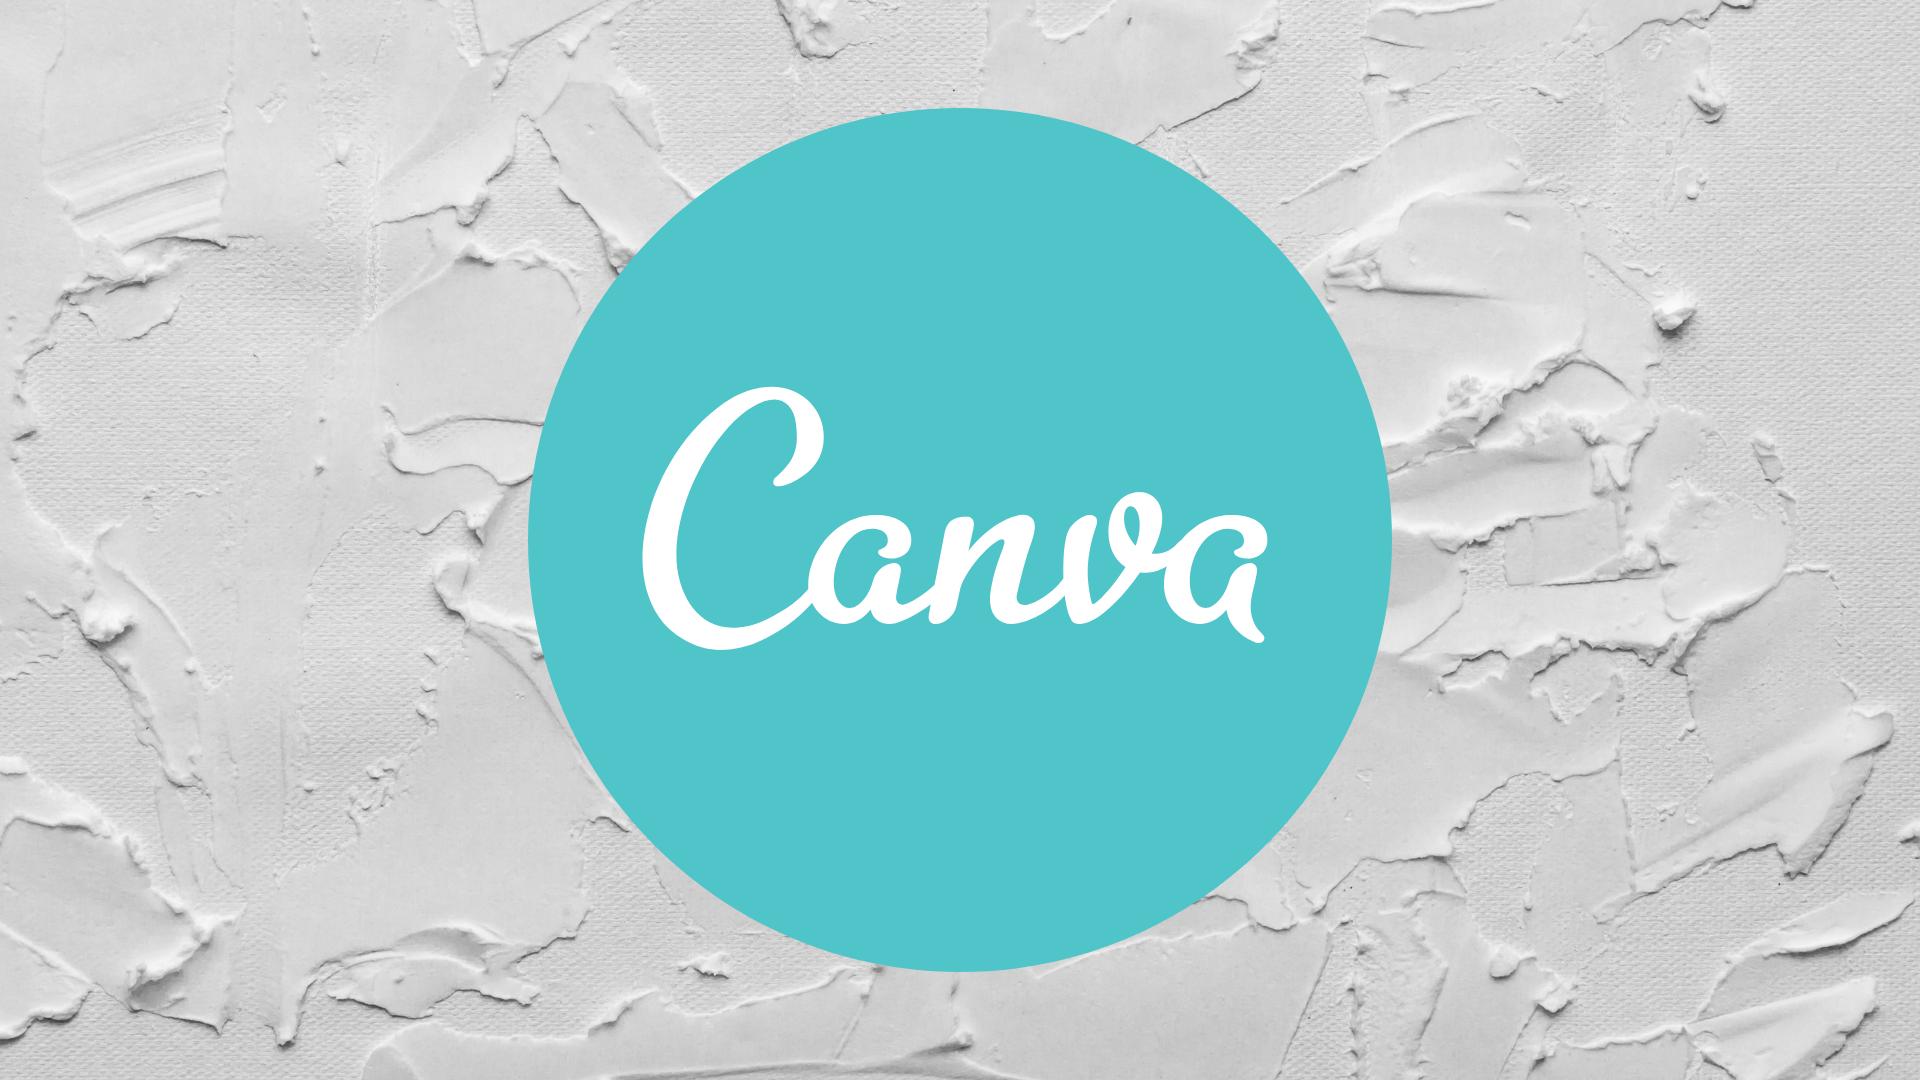 Canva valuation soars to $8.7 billion